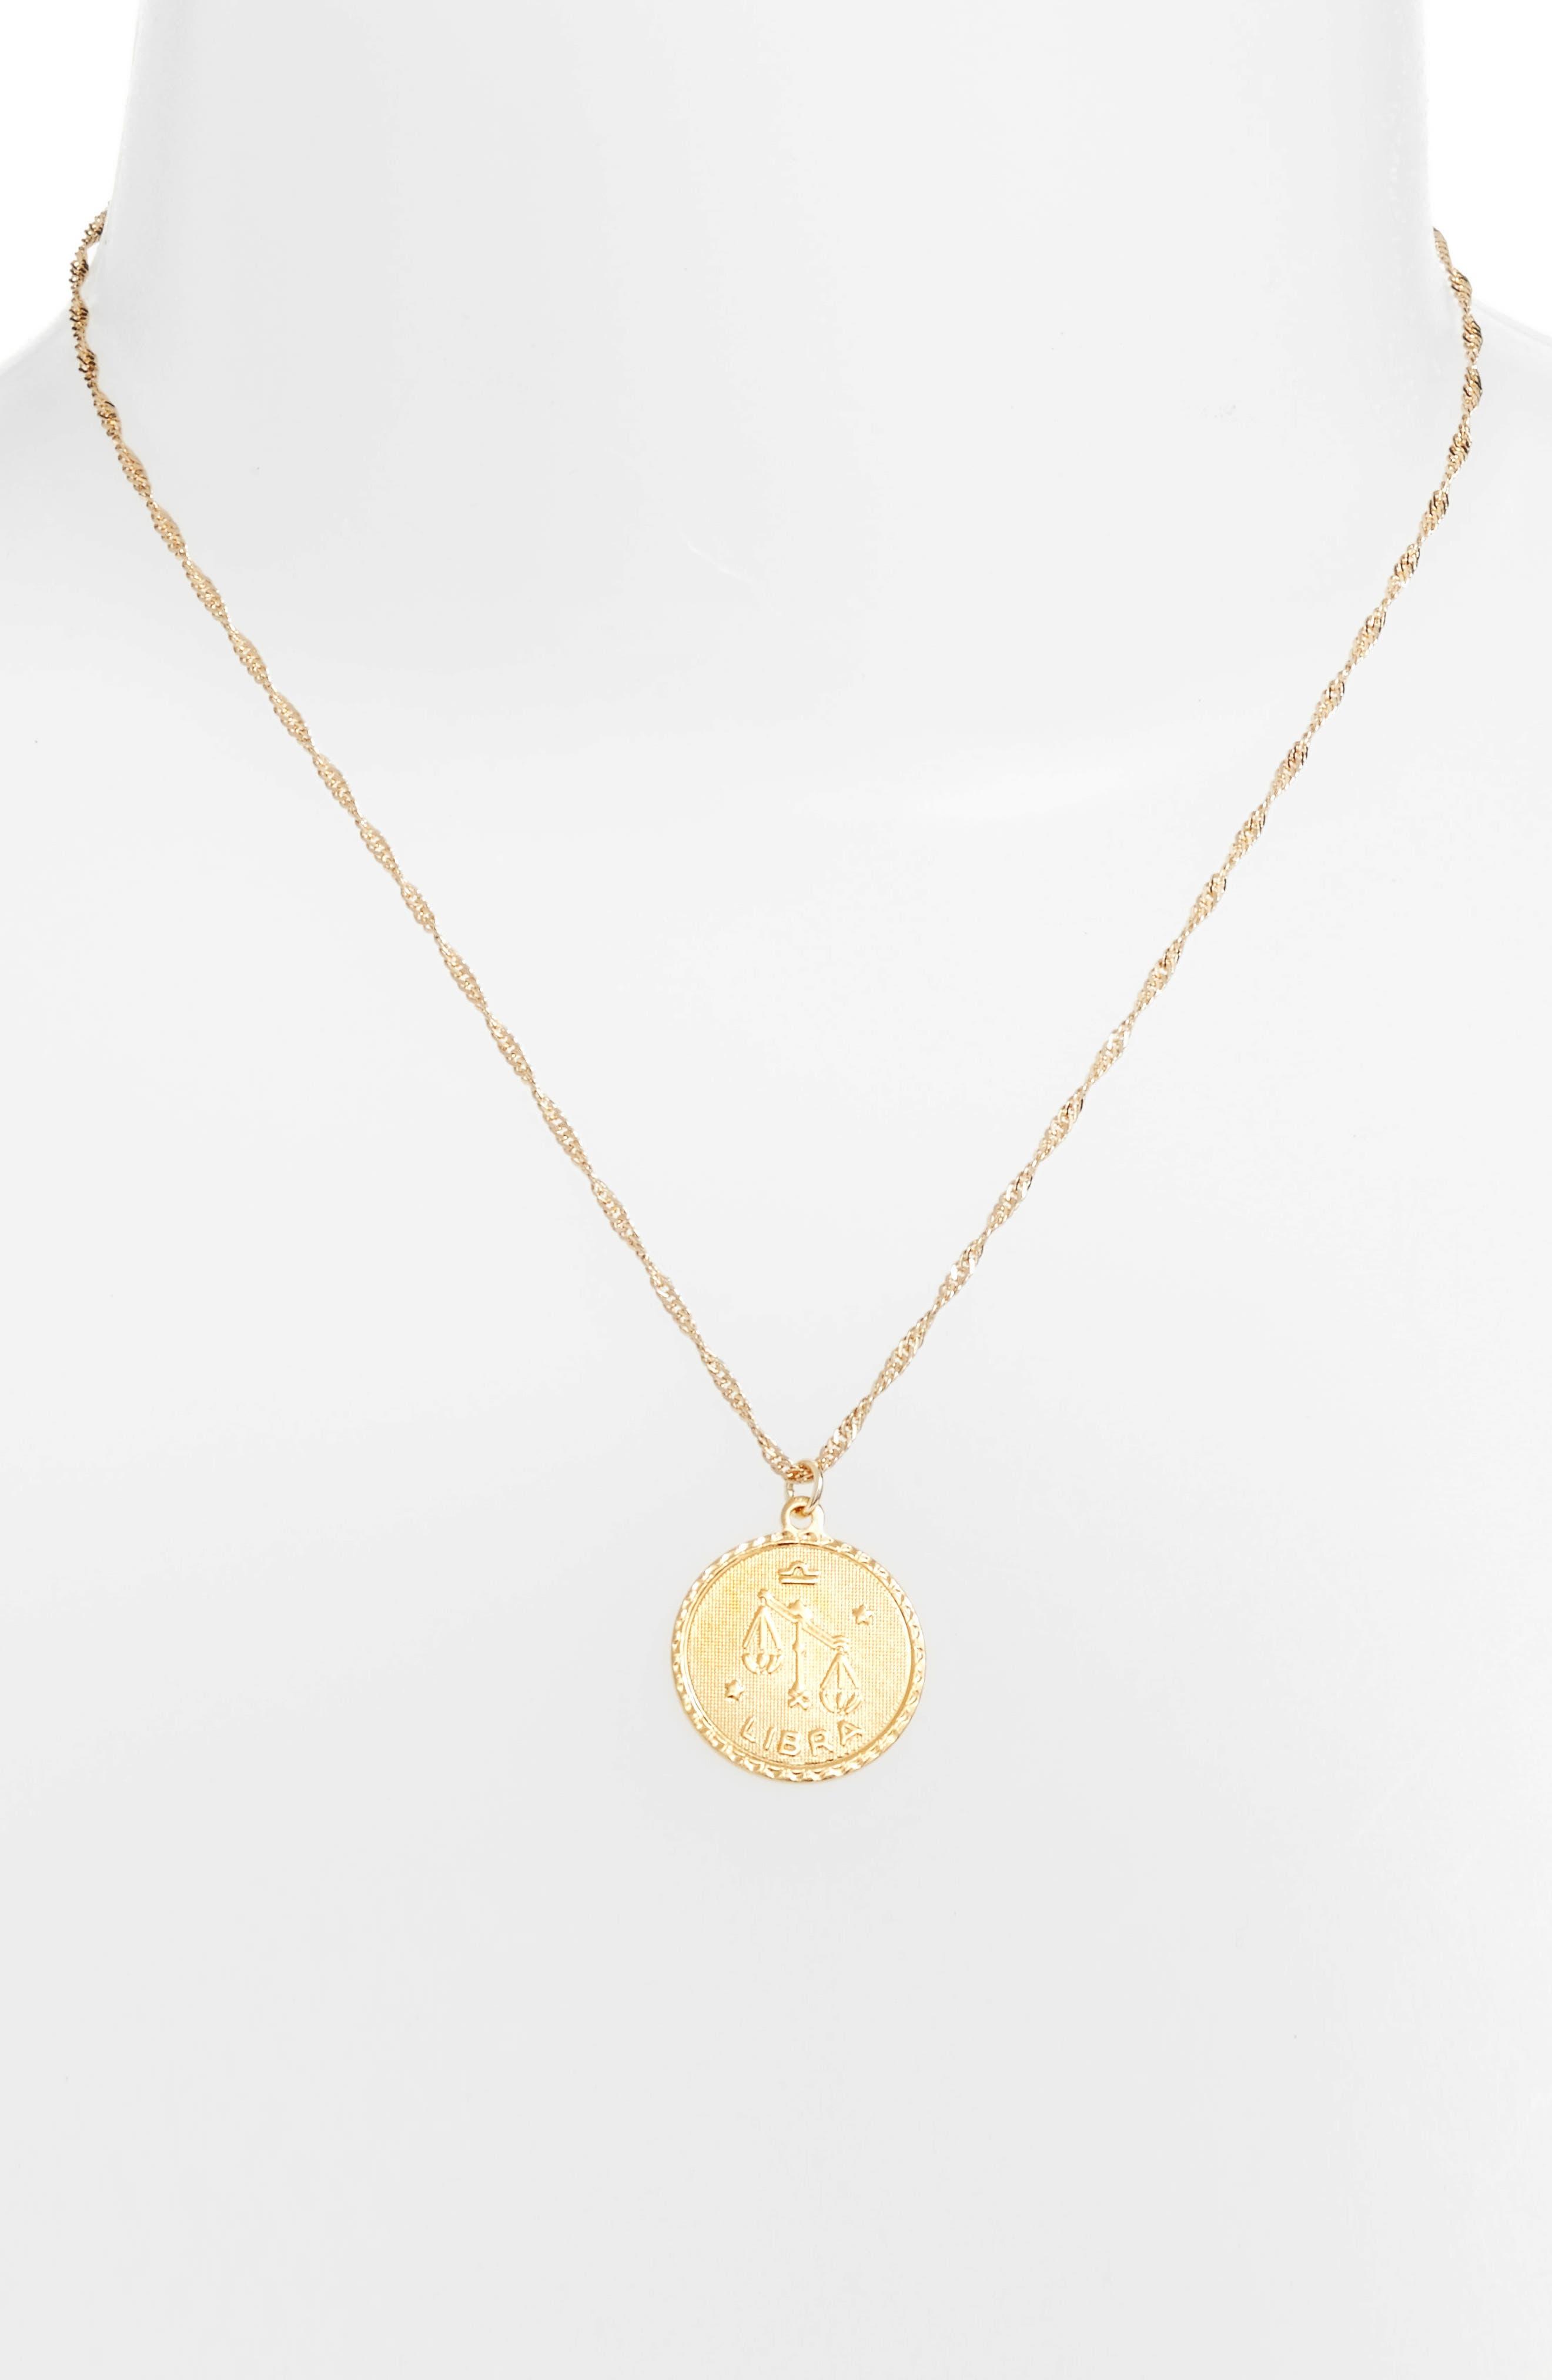 Ascending Libra Pendant Necklace,                             Alternate thumbnail 2, color,                             Yellow Gold